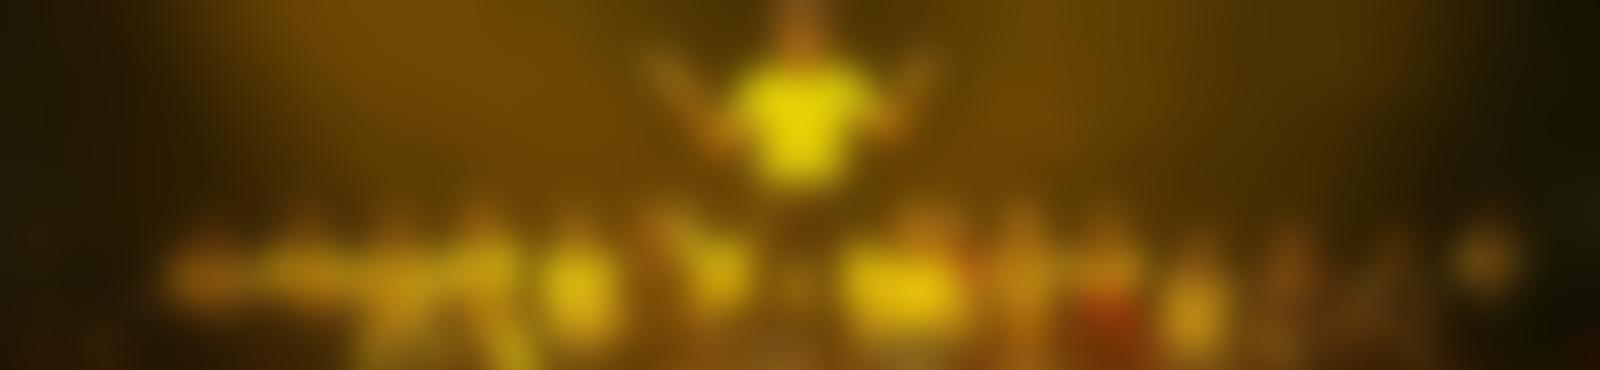 Blurred 228a04e0 0d04 48dd 9822 7dbc411a6cff